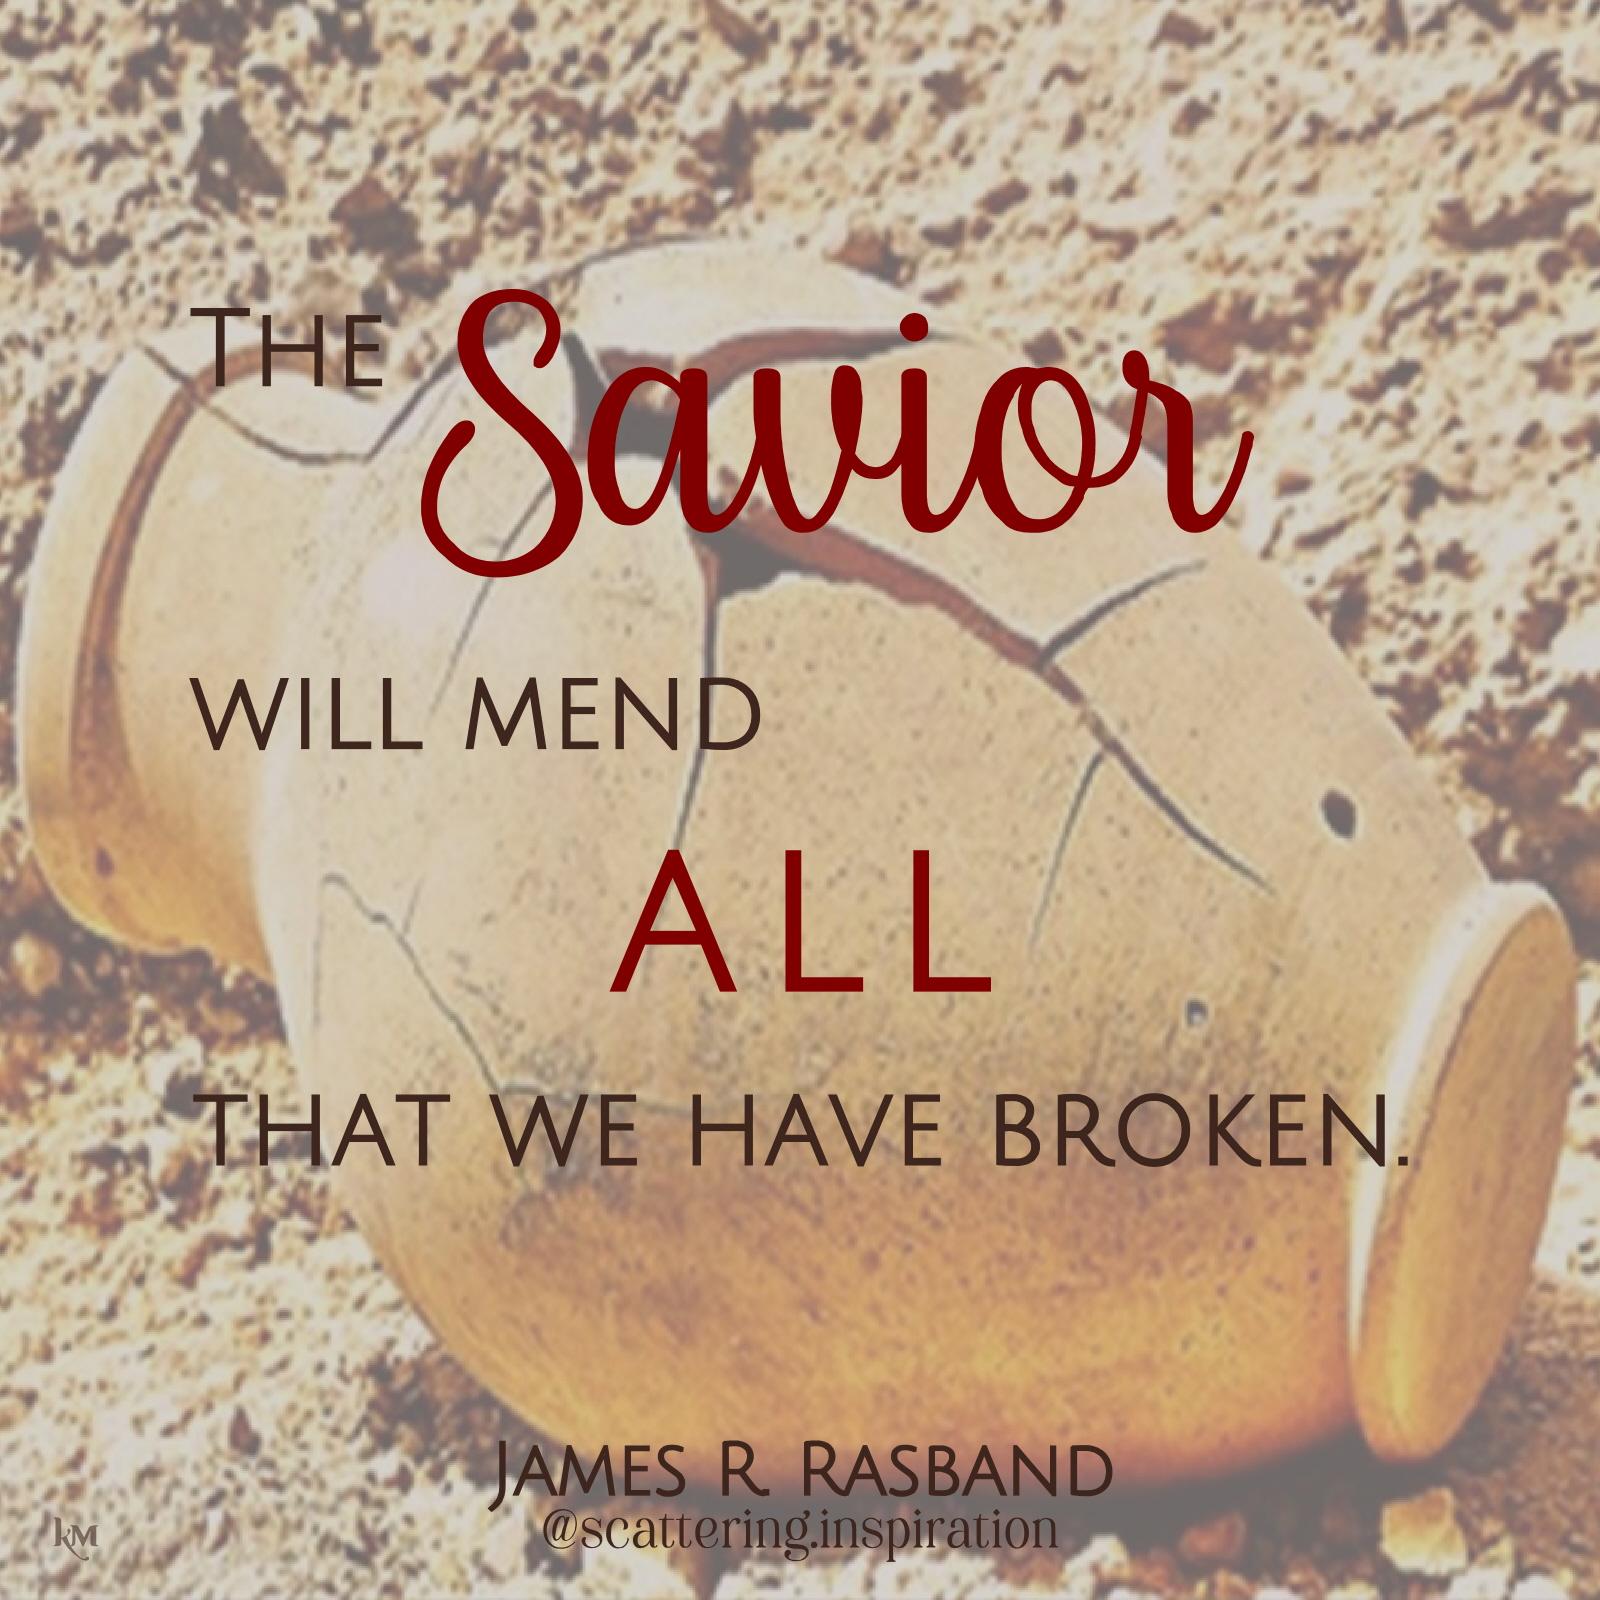 the Savior will mend